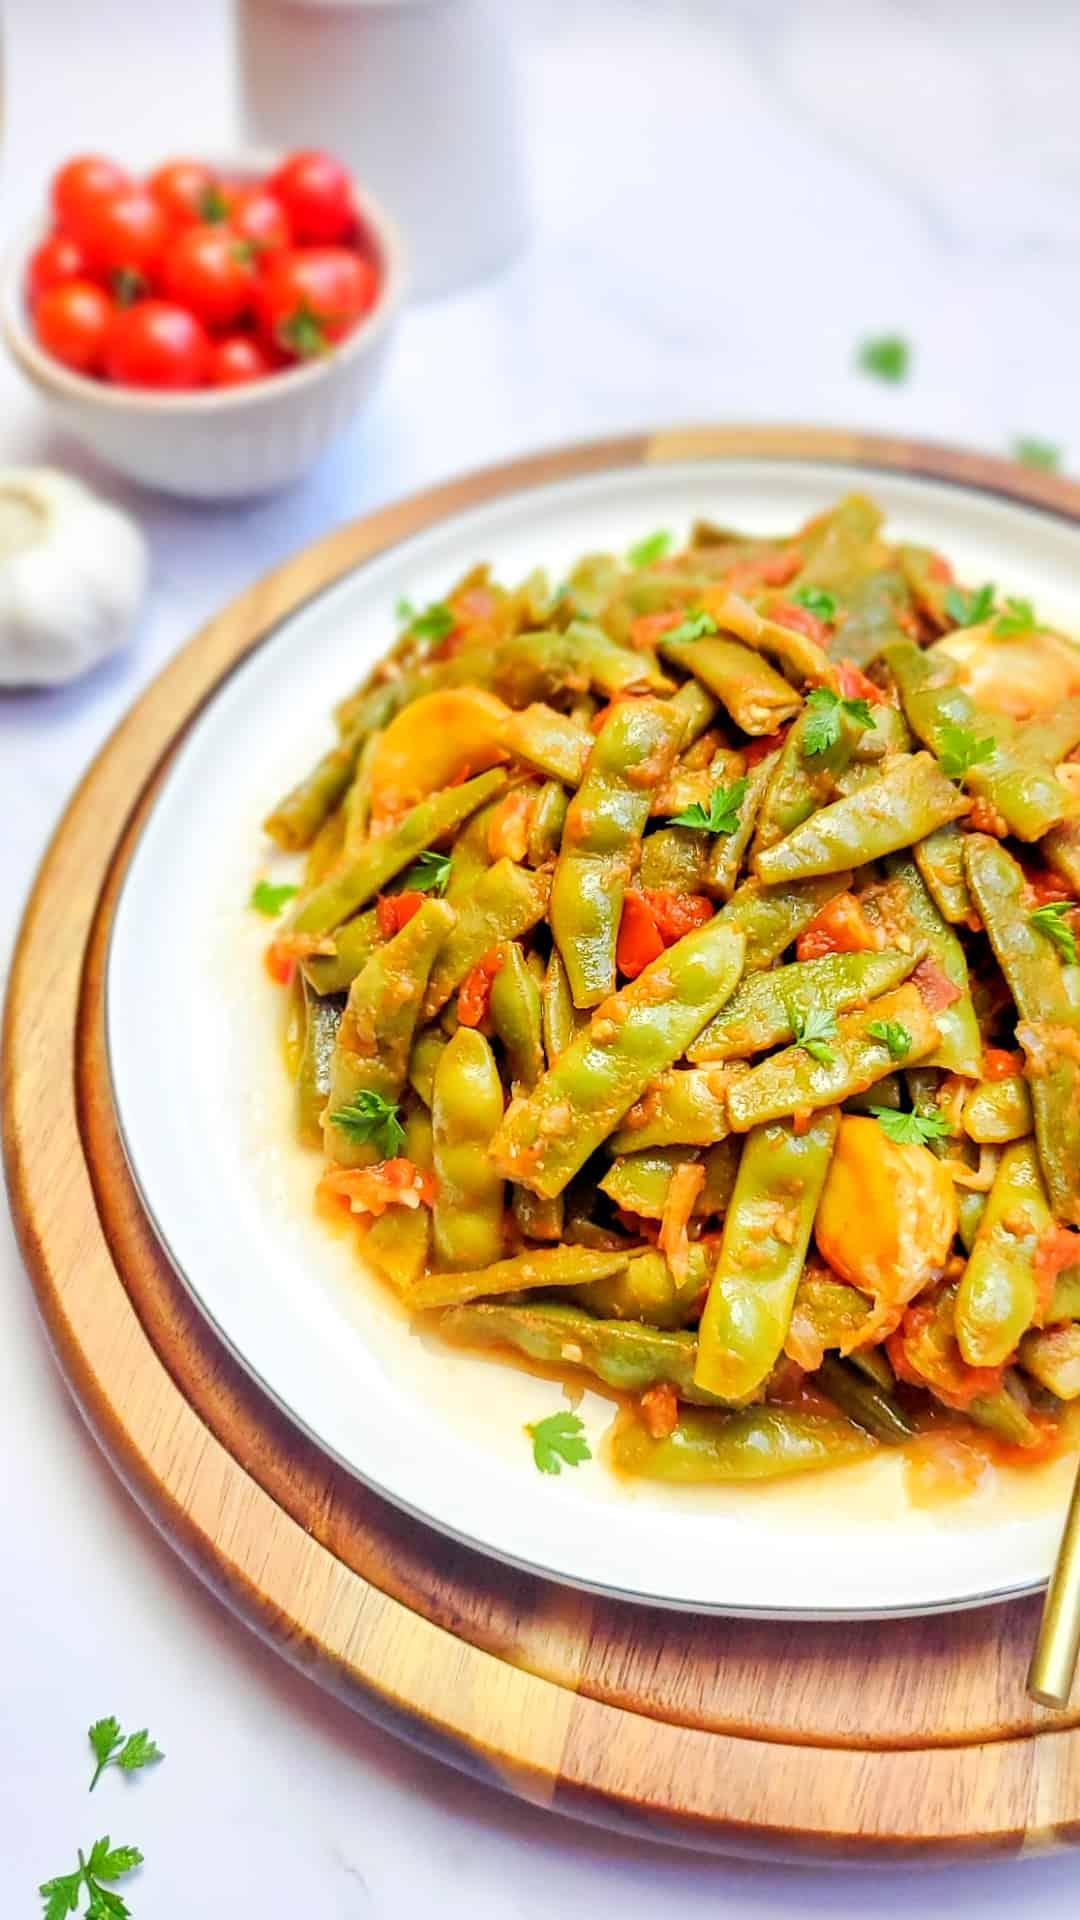 Loubie Bzeit- Braised Green Beans